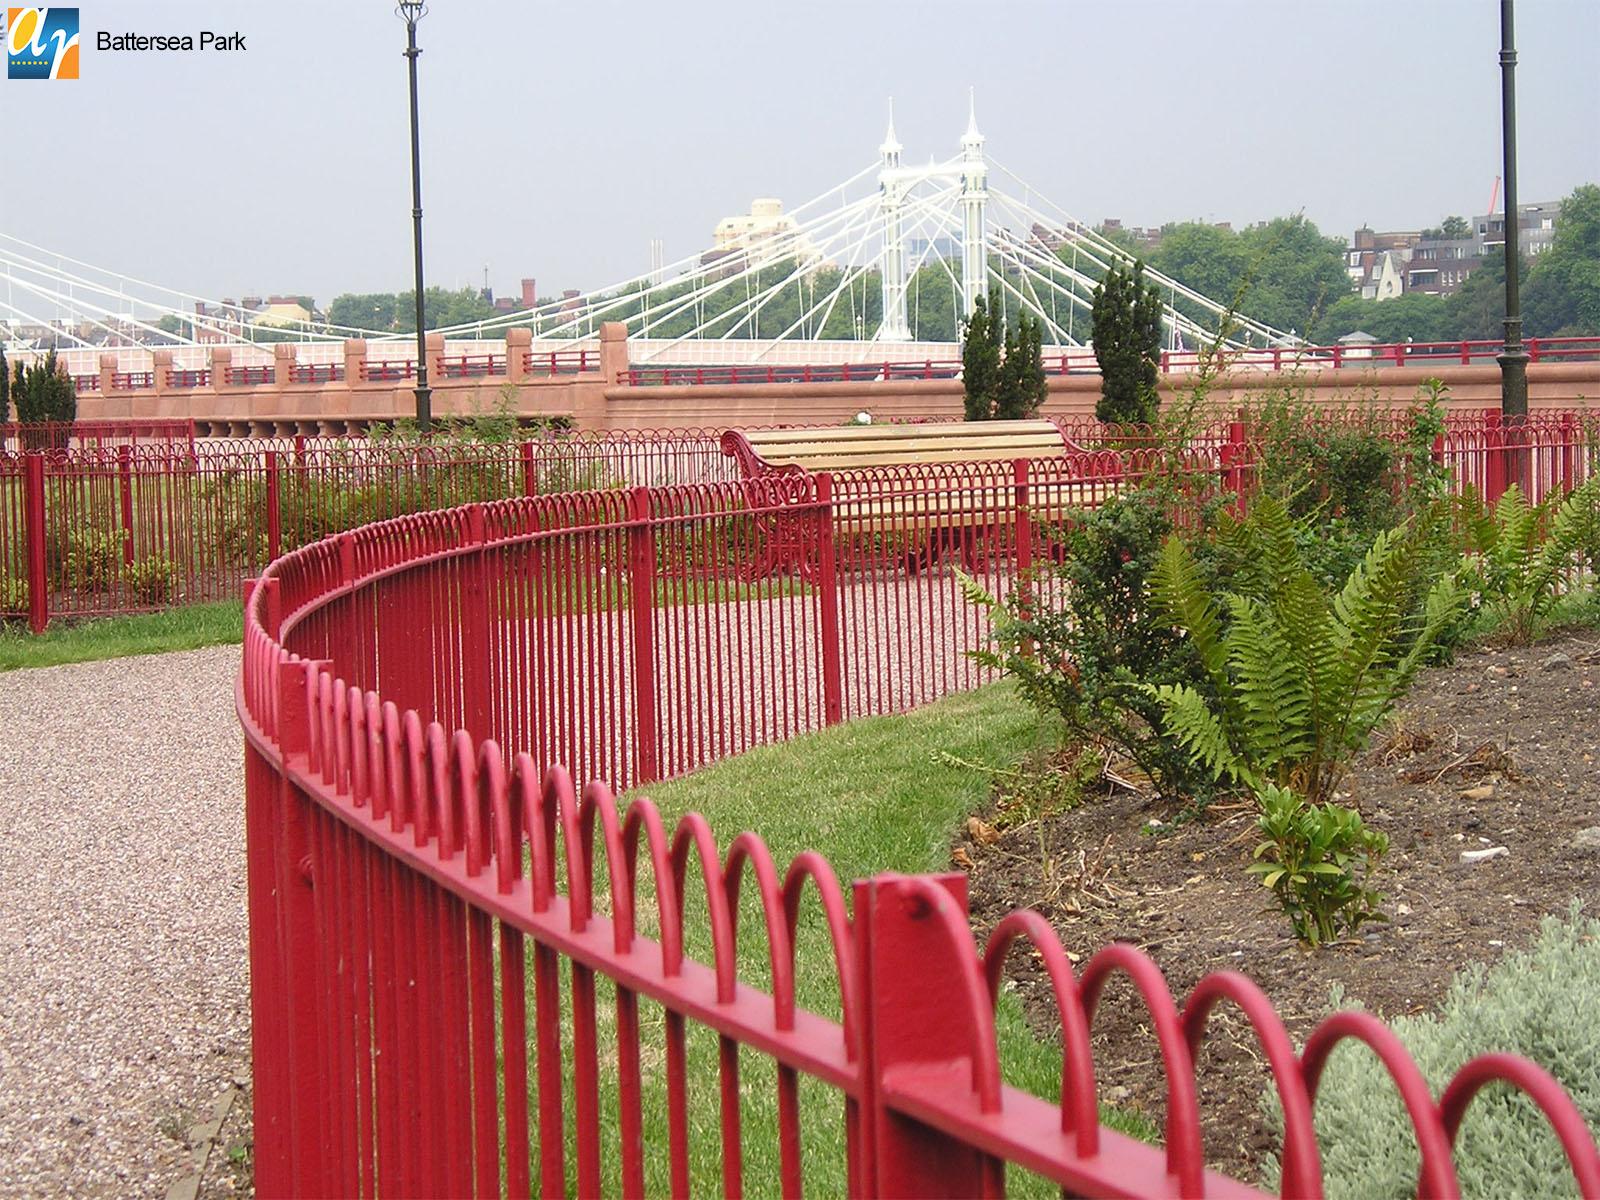 Bespoke metal railings for parks